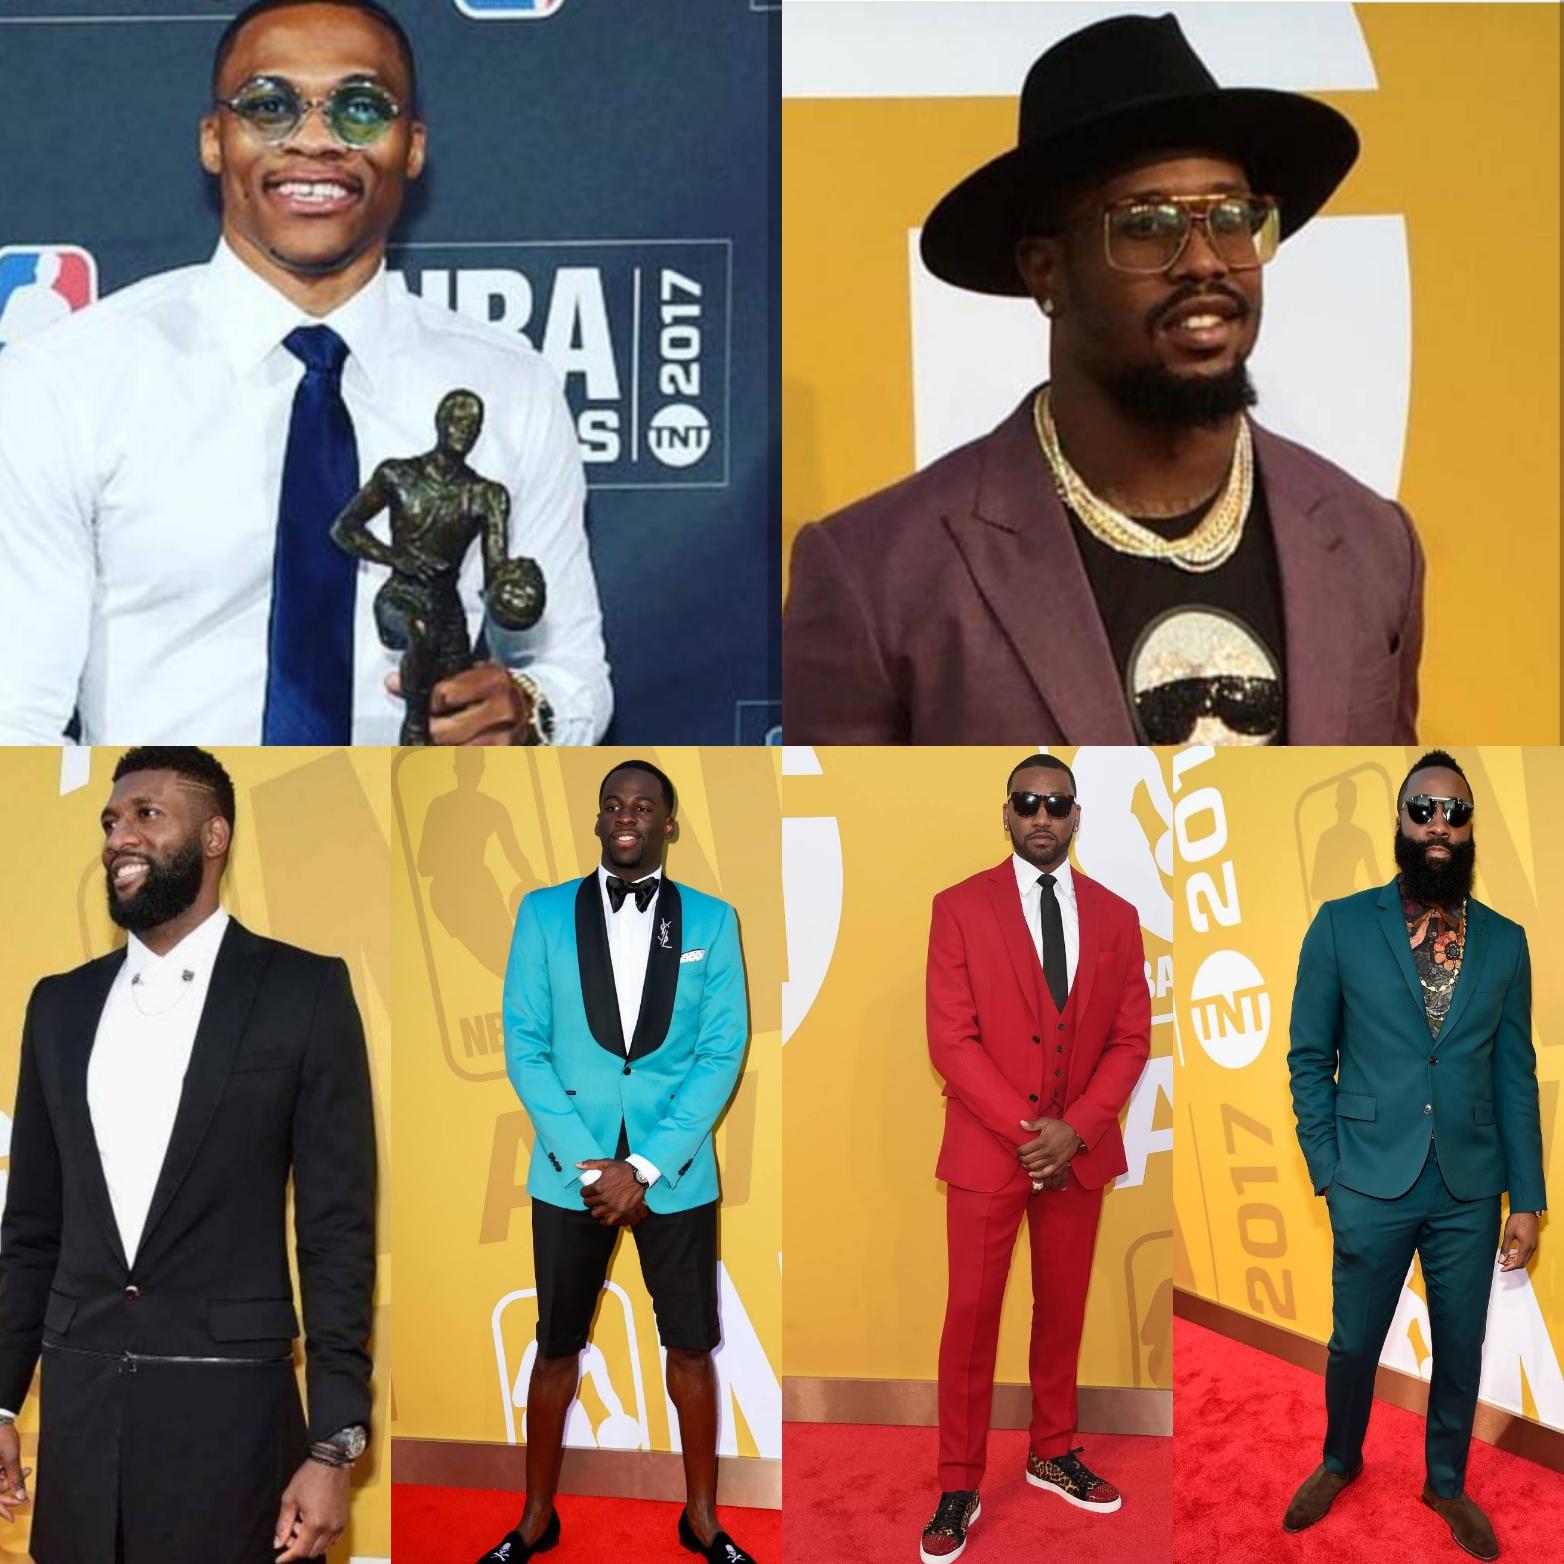 NBA Awards 2017: 6 Best-Dressed Athletes